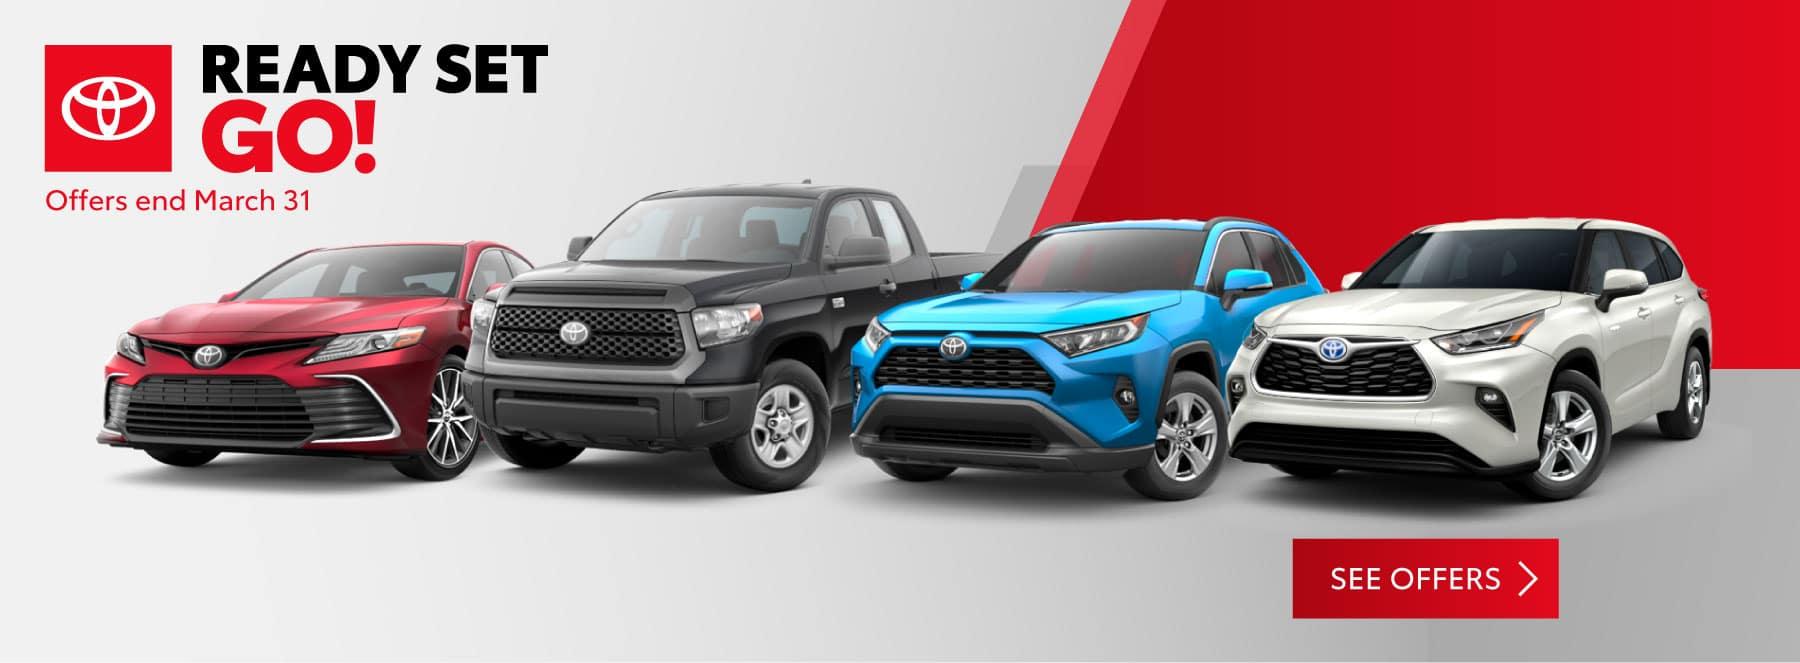 Toyota - Ready Set Go!